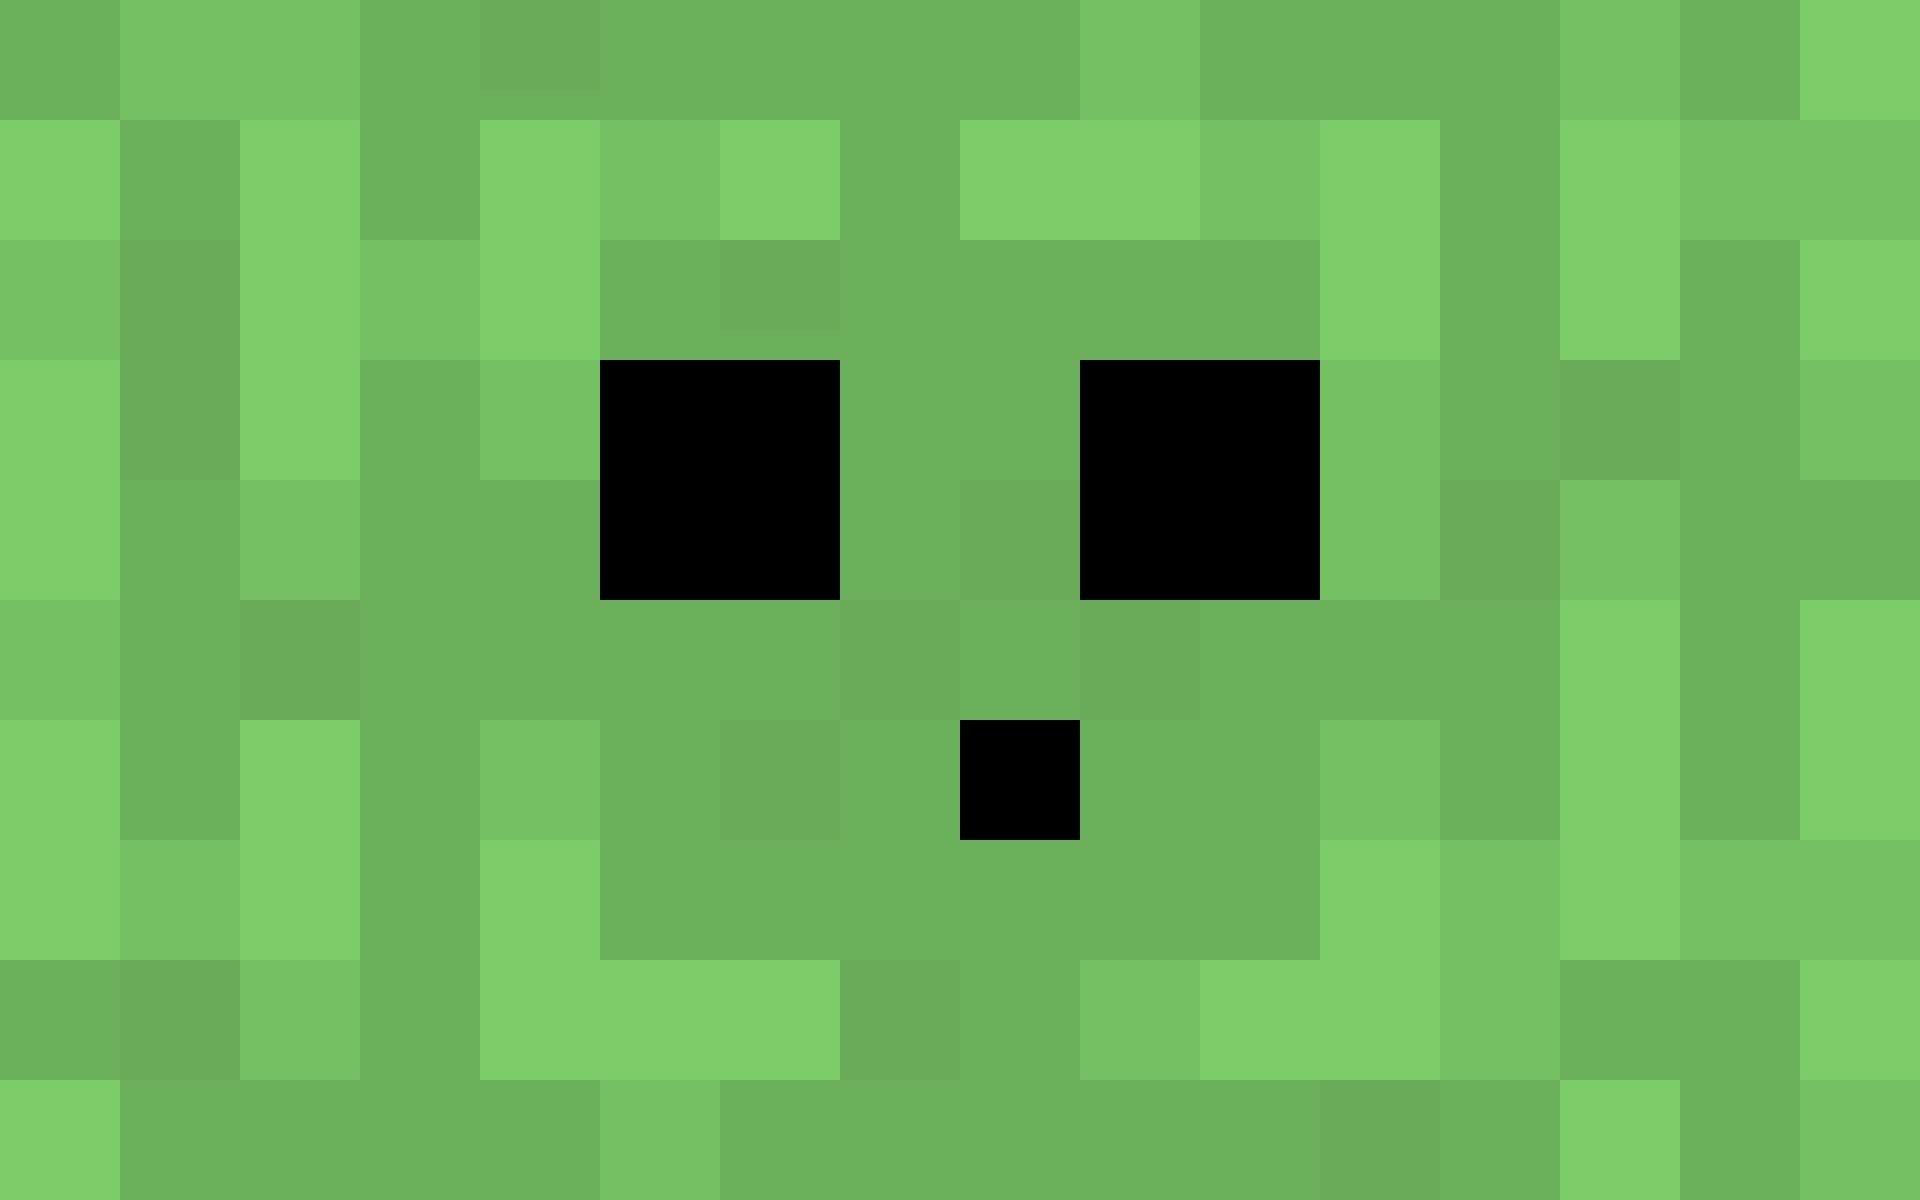 Top Wallpaper Minecraft Thanksgiving - 701277-free-minecraft-backgrounds-1920x1200-smartphone  Gallery_682886.jpg